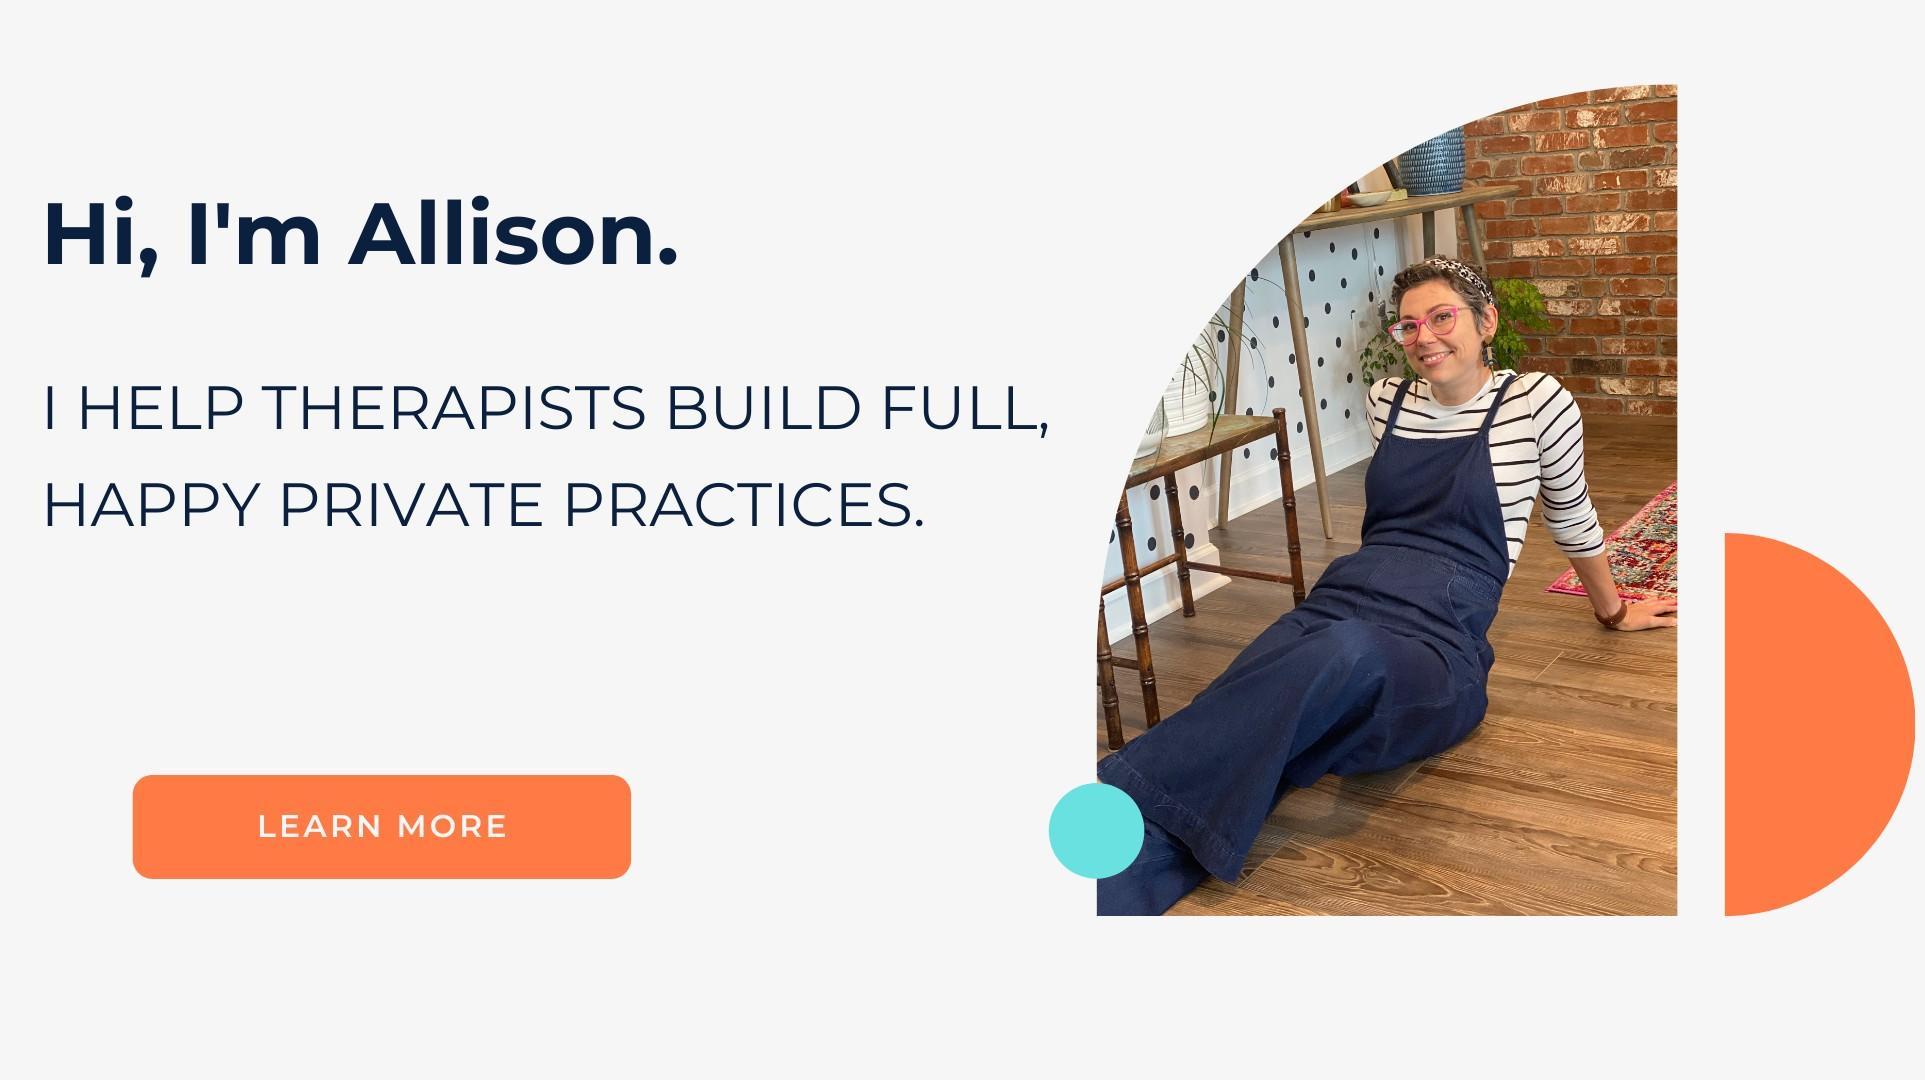 I HELP THERAPISTS BUILD FULL, HAPPY PRACTICES.